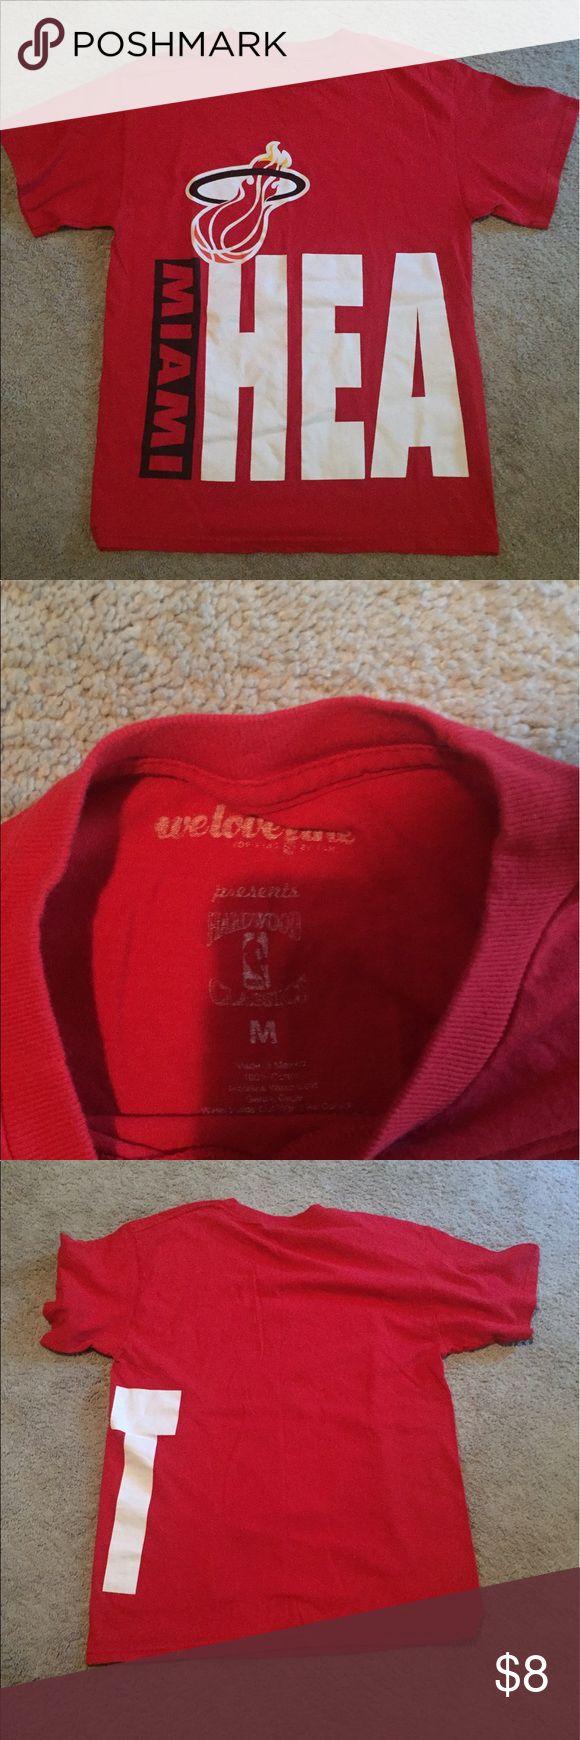 Miami heat shirt Awesome Miami heat basketball shirt! Large print logo! Size is medium hardwood classics Shirts Tees - Short Sleeve